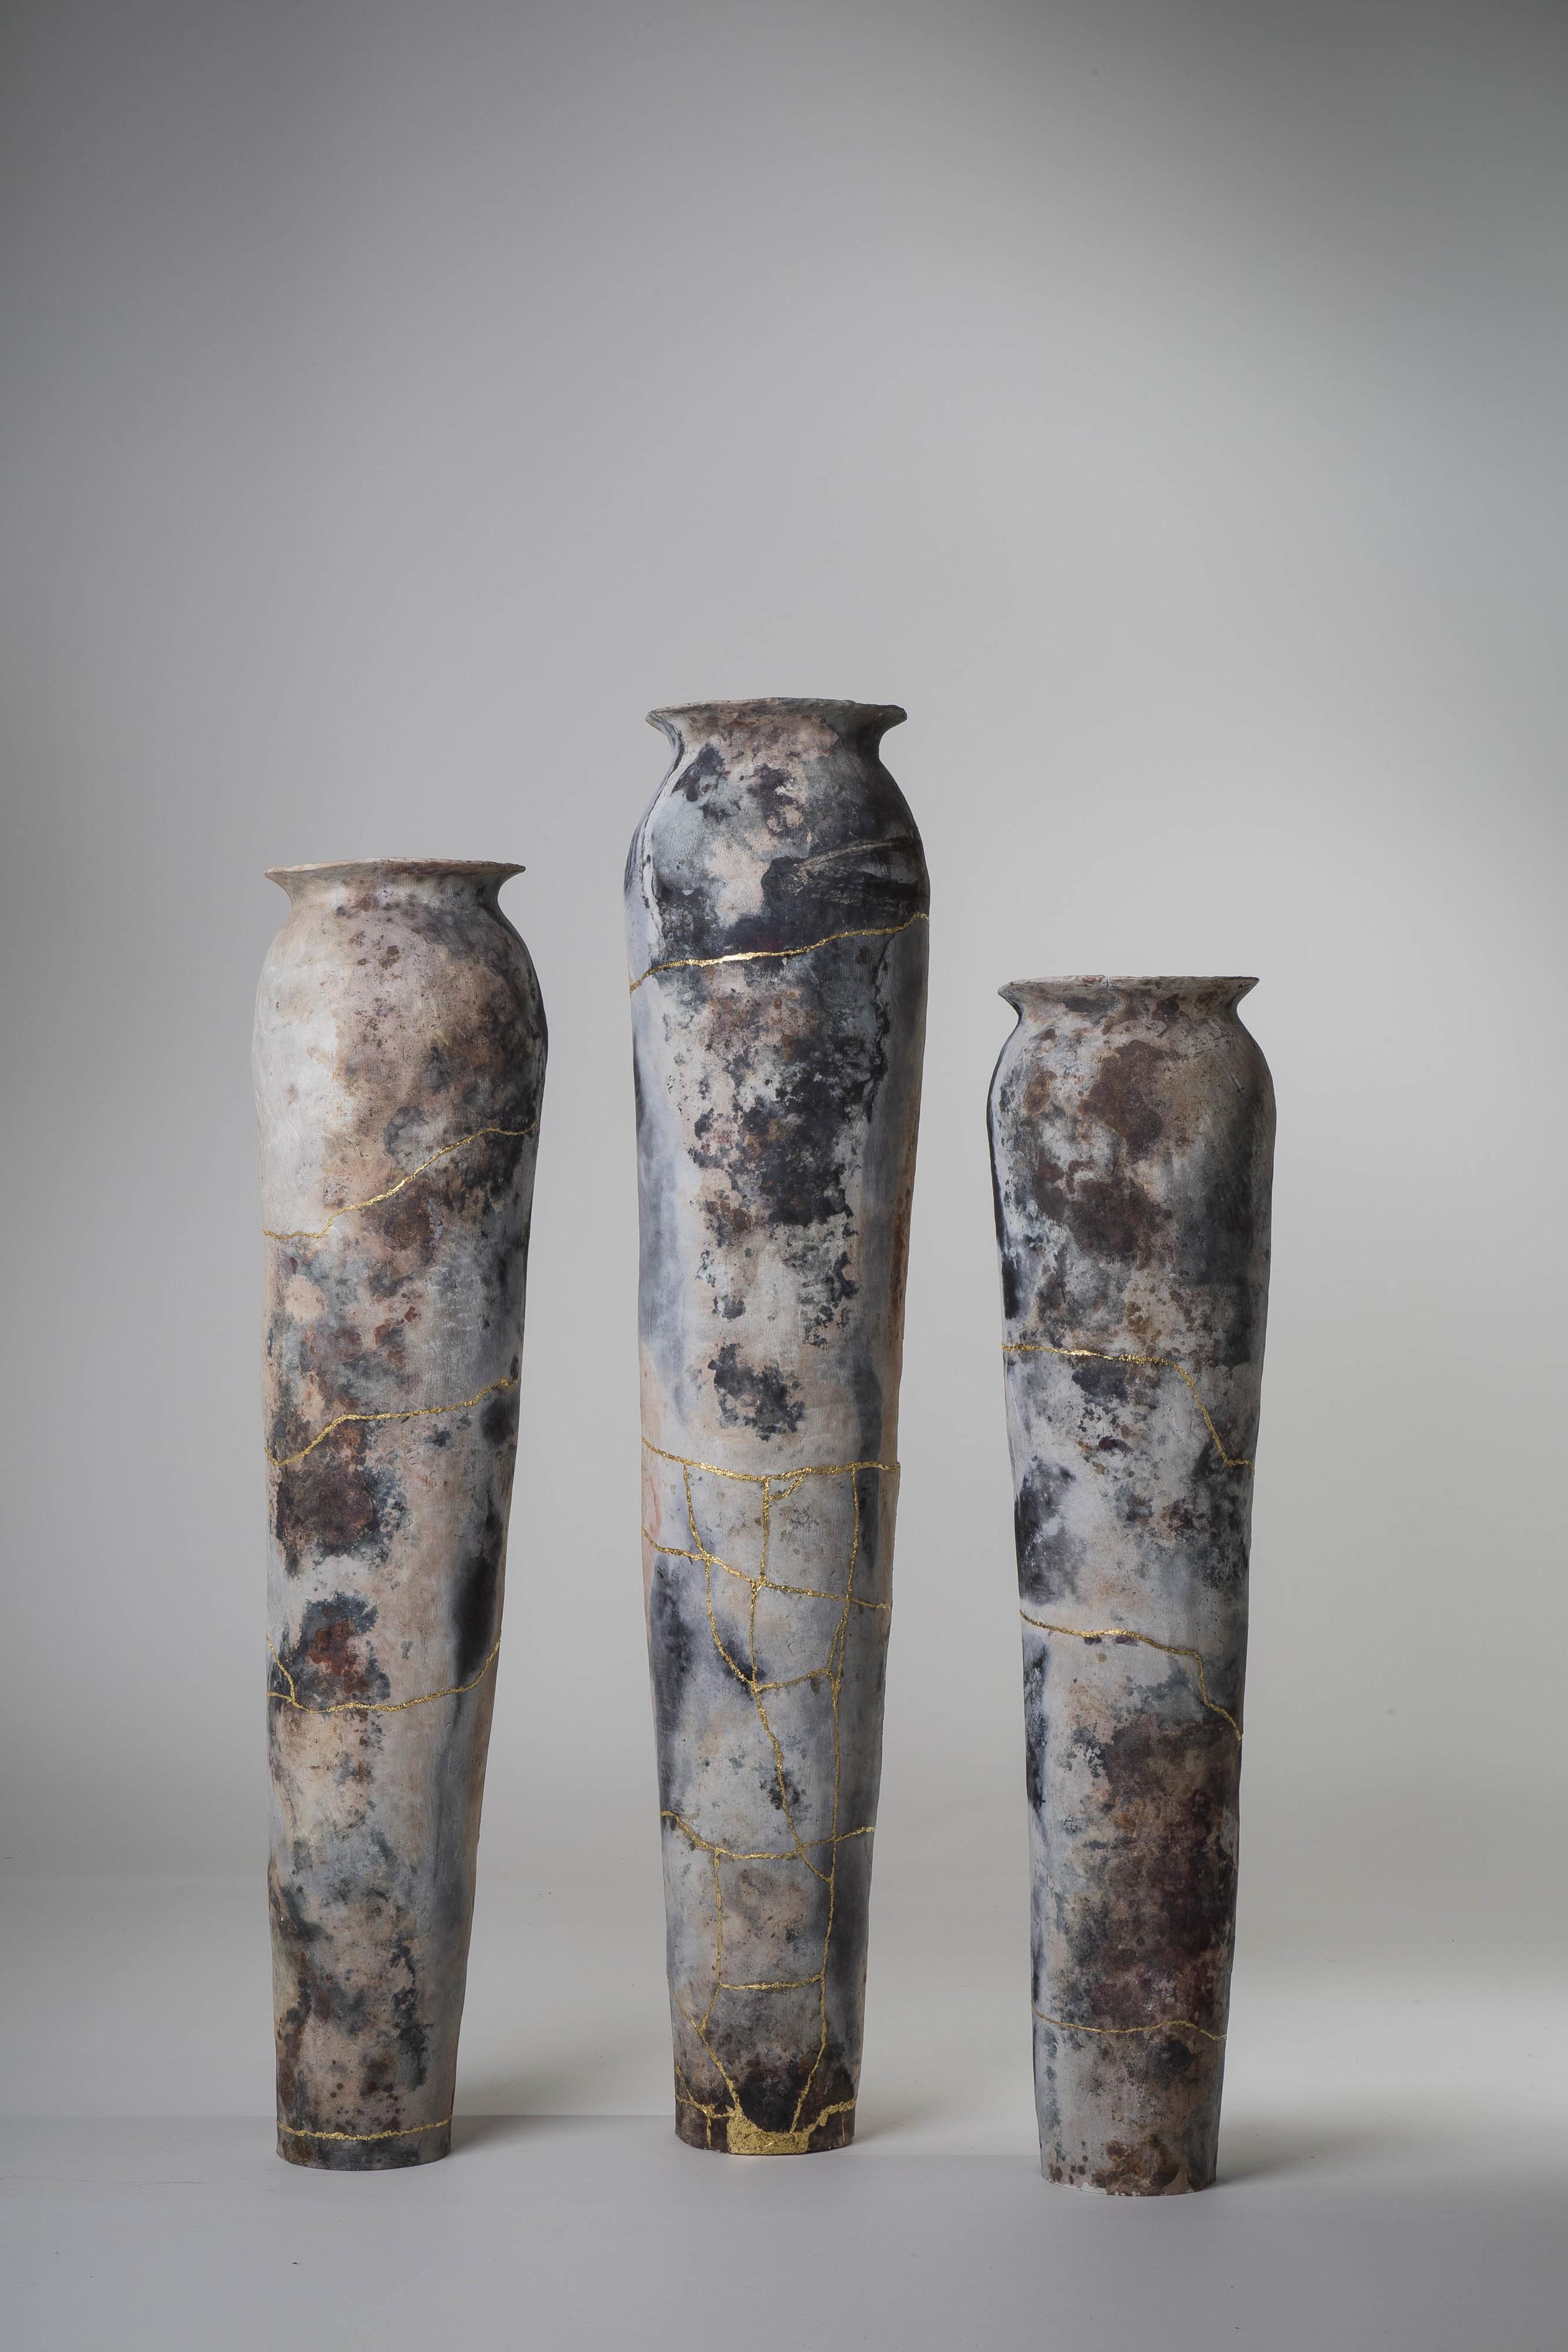 3 RJ rhian pots-603.jpg